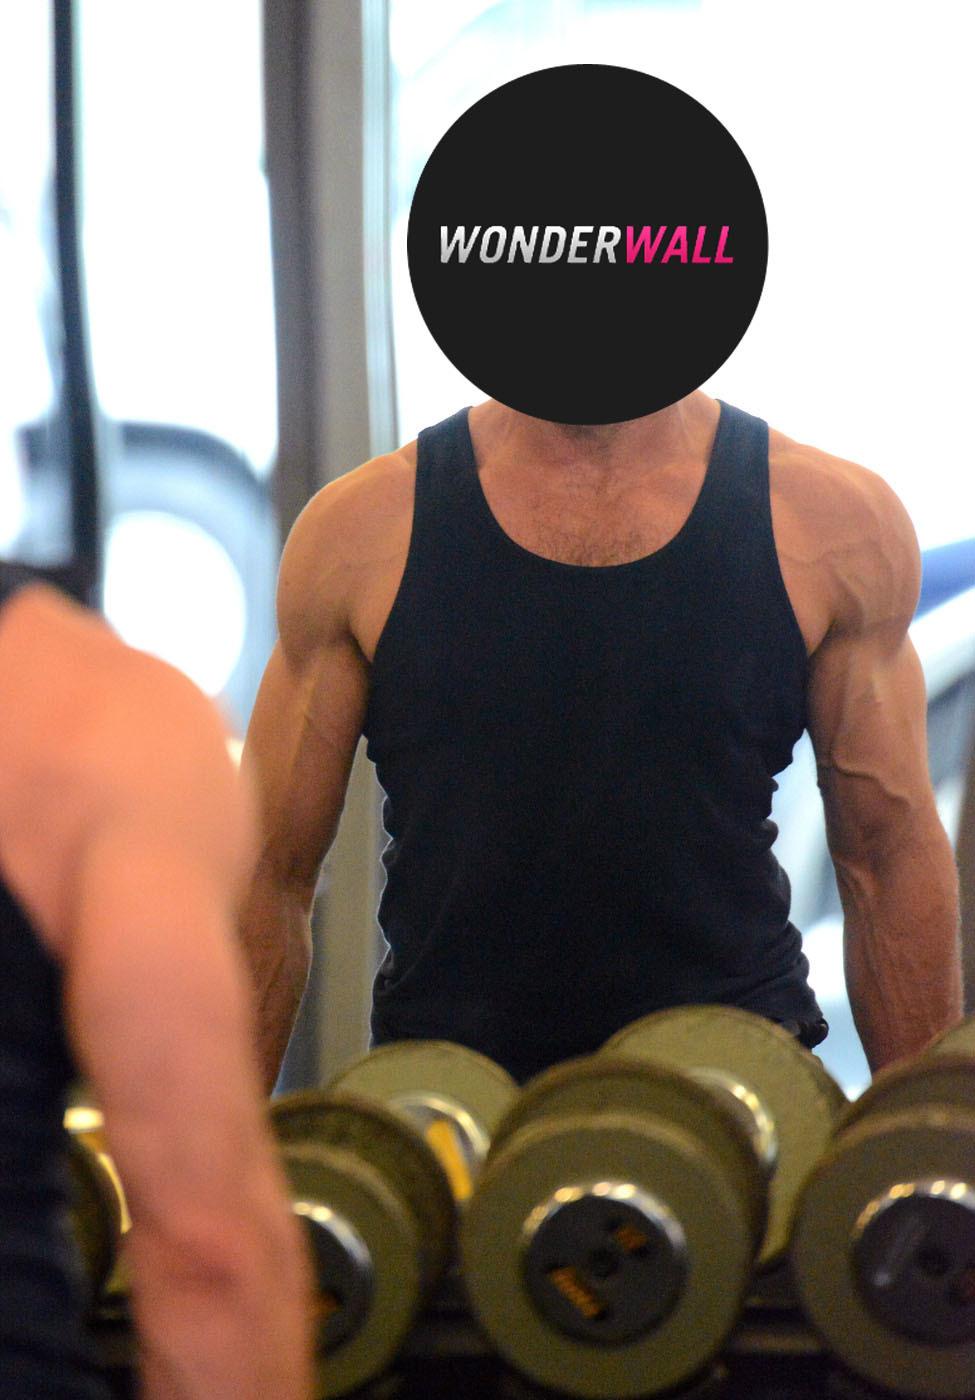 hugh jackman working out